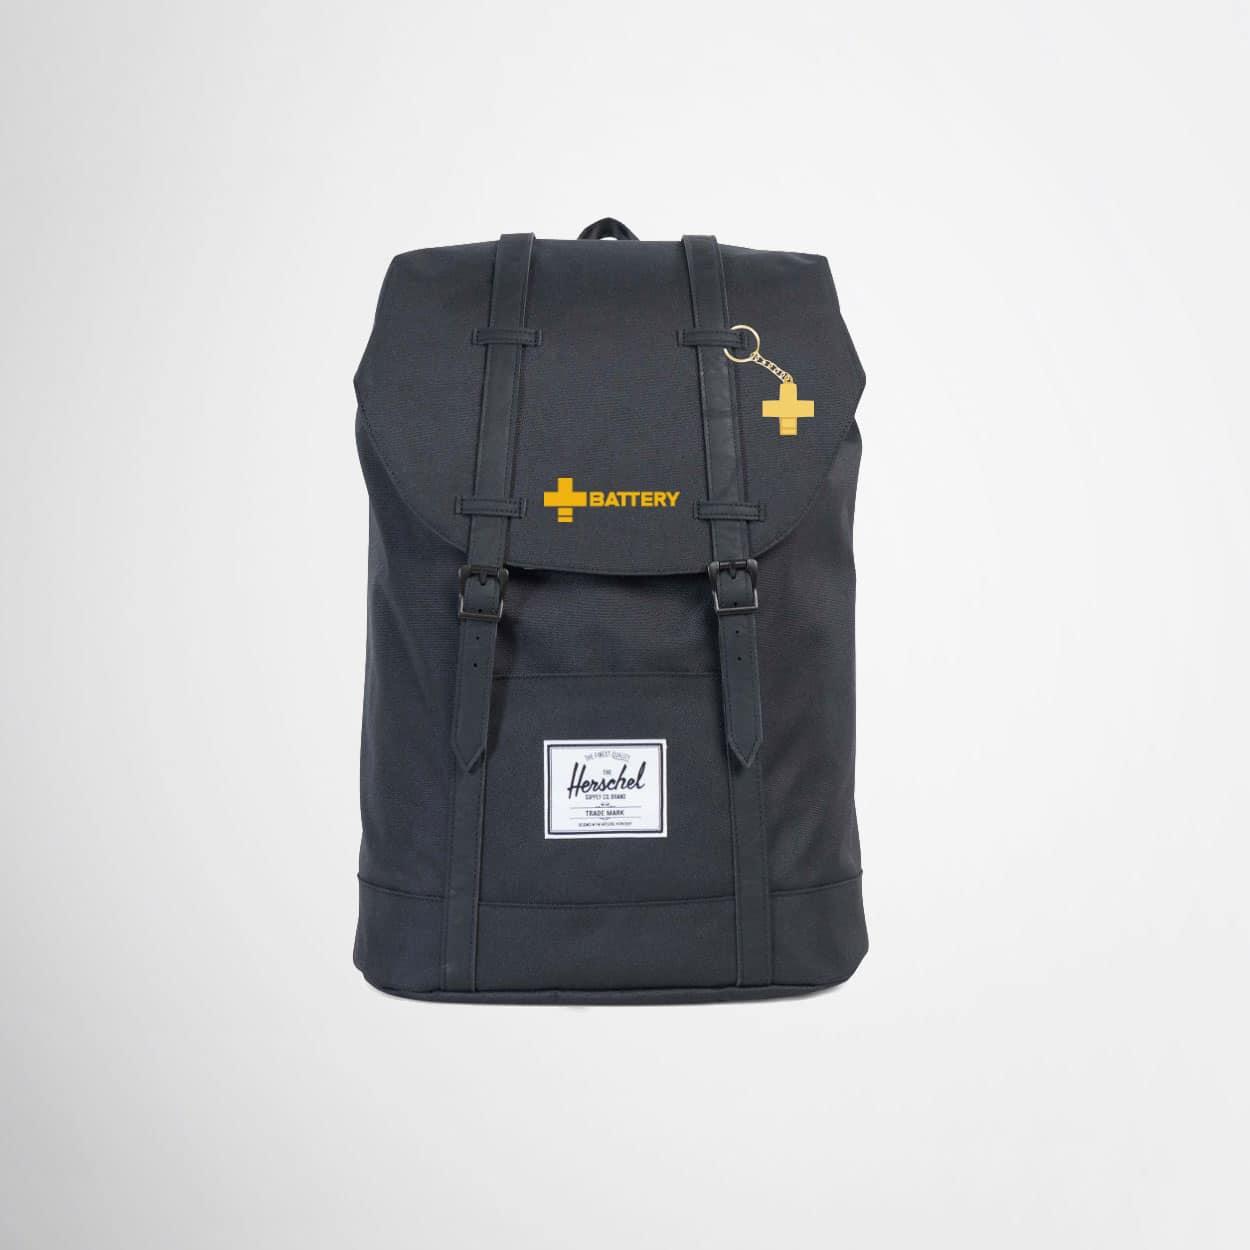 Branded Herschel backpacks for Battery Energy Drink by Framme